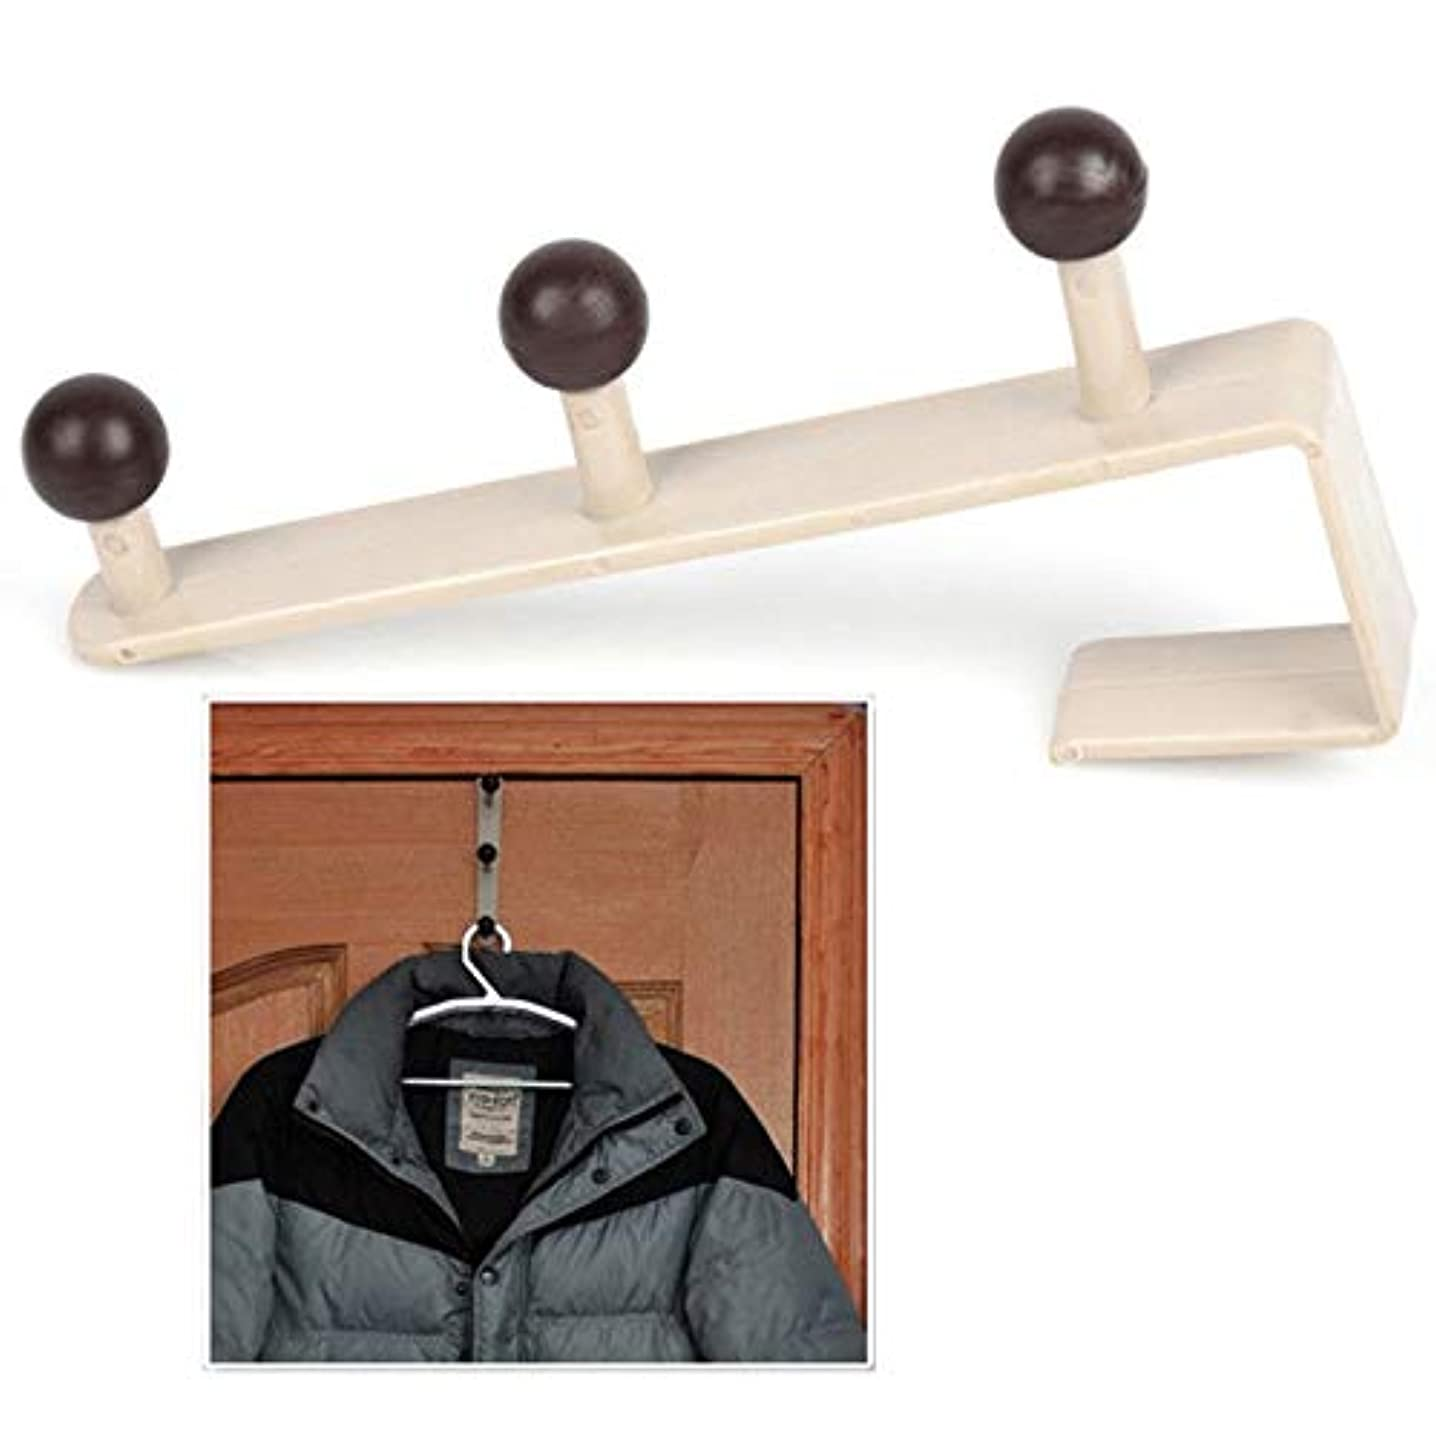 Agordo Over The Door Hanger Hooks Rack for Coat Hat Bags Clothes Towel Home Bathroom